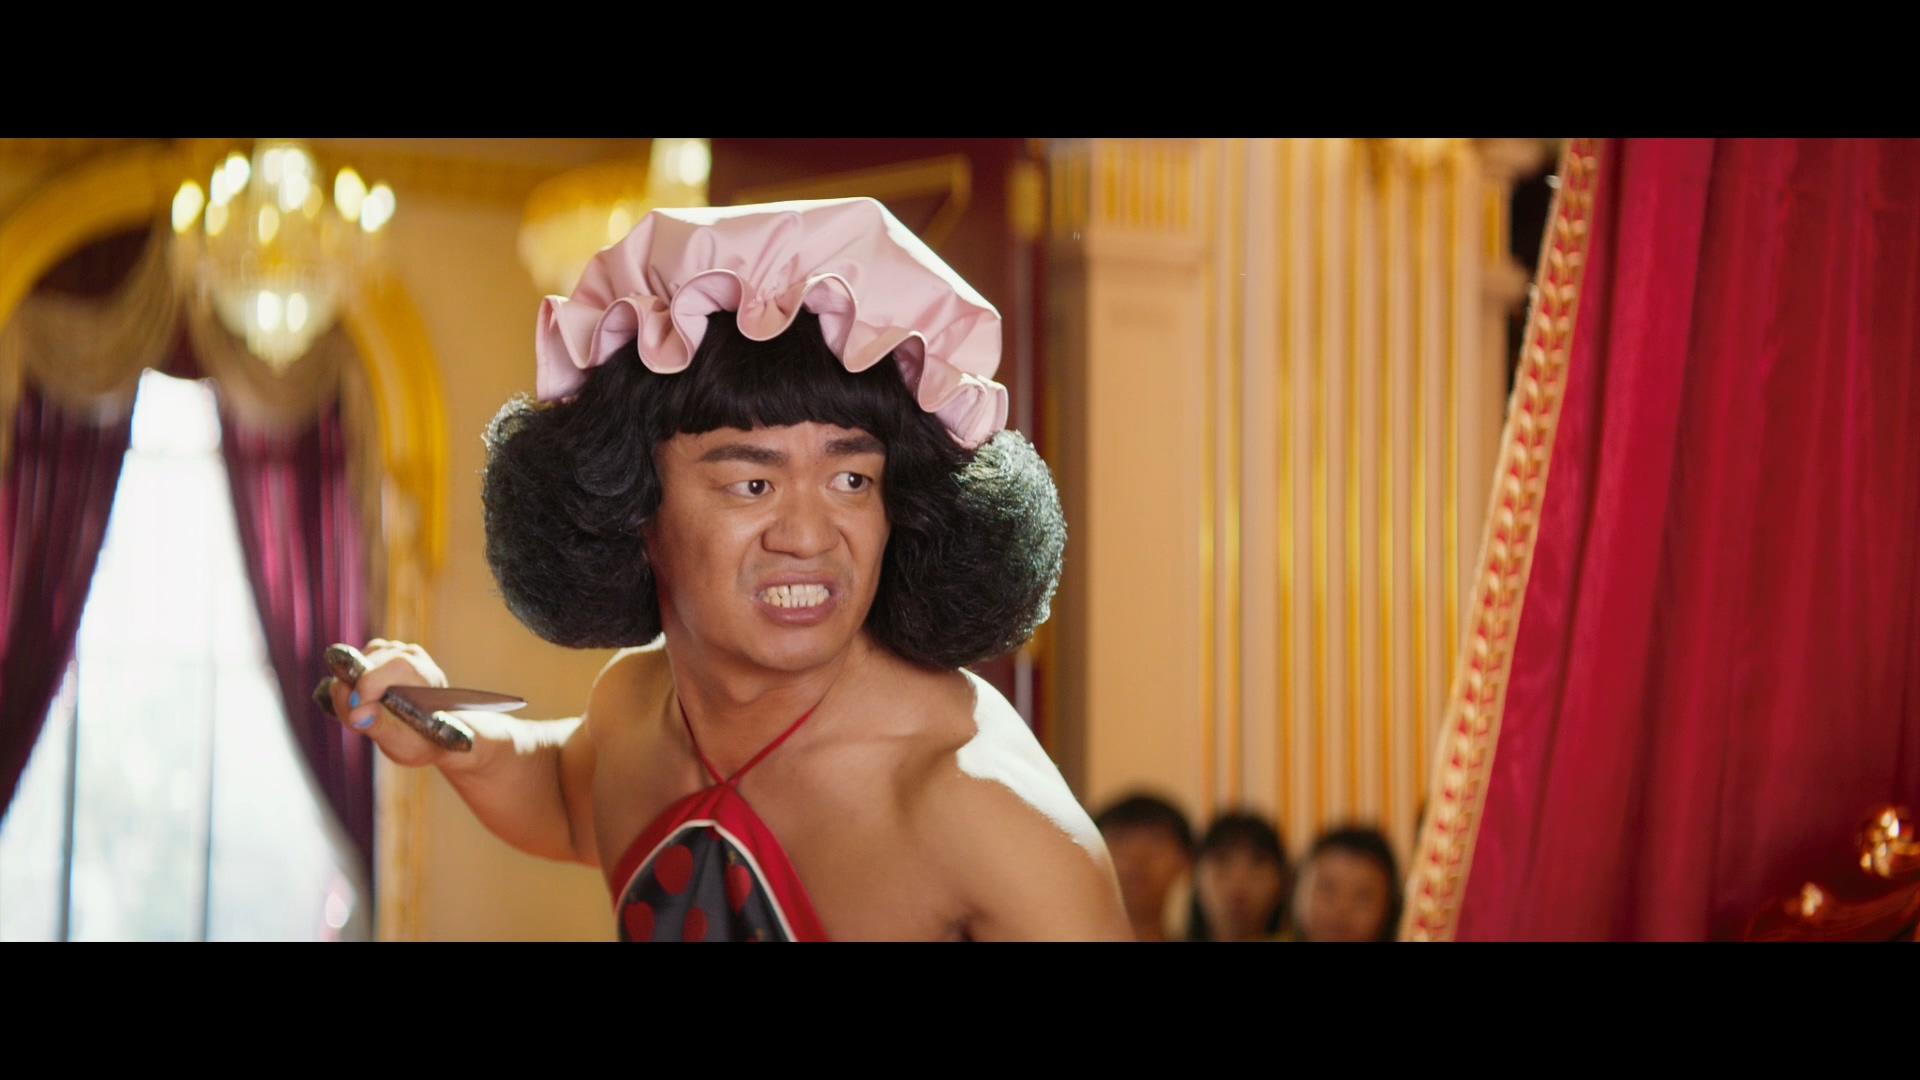 The.New.King.of.Comedy.2019.1080p.BluRay.Remux.AVC.TrueHD.5.1-PTer.mkv_20190901_171604.6146de7c79942751db4.jpg